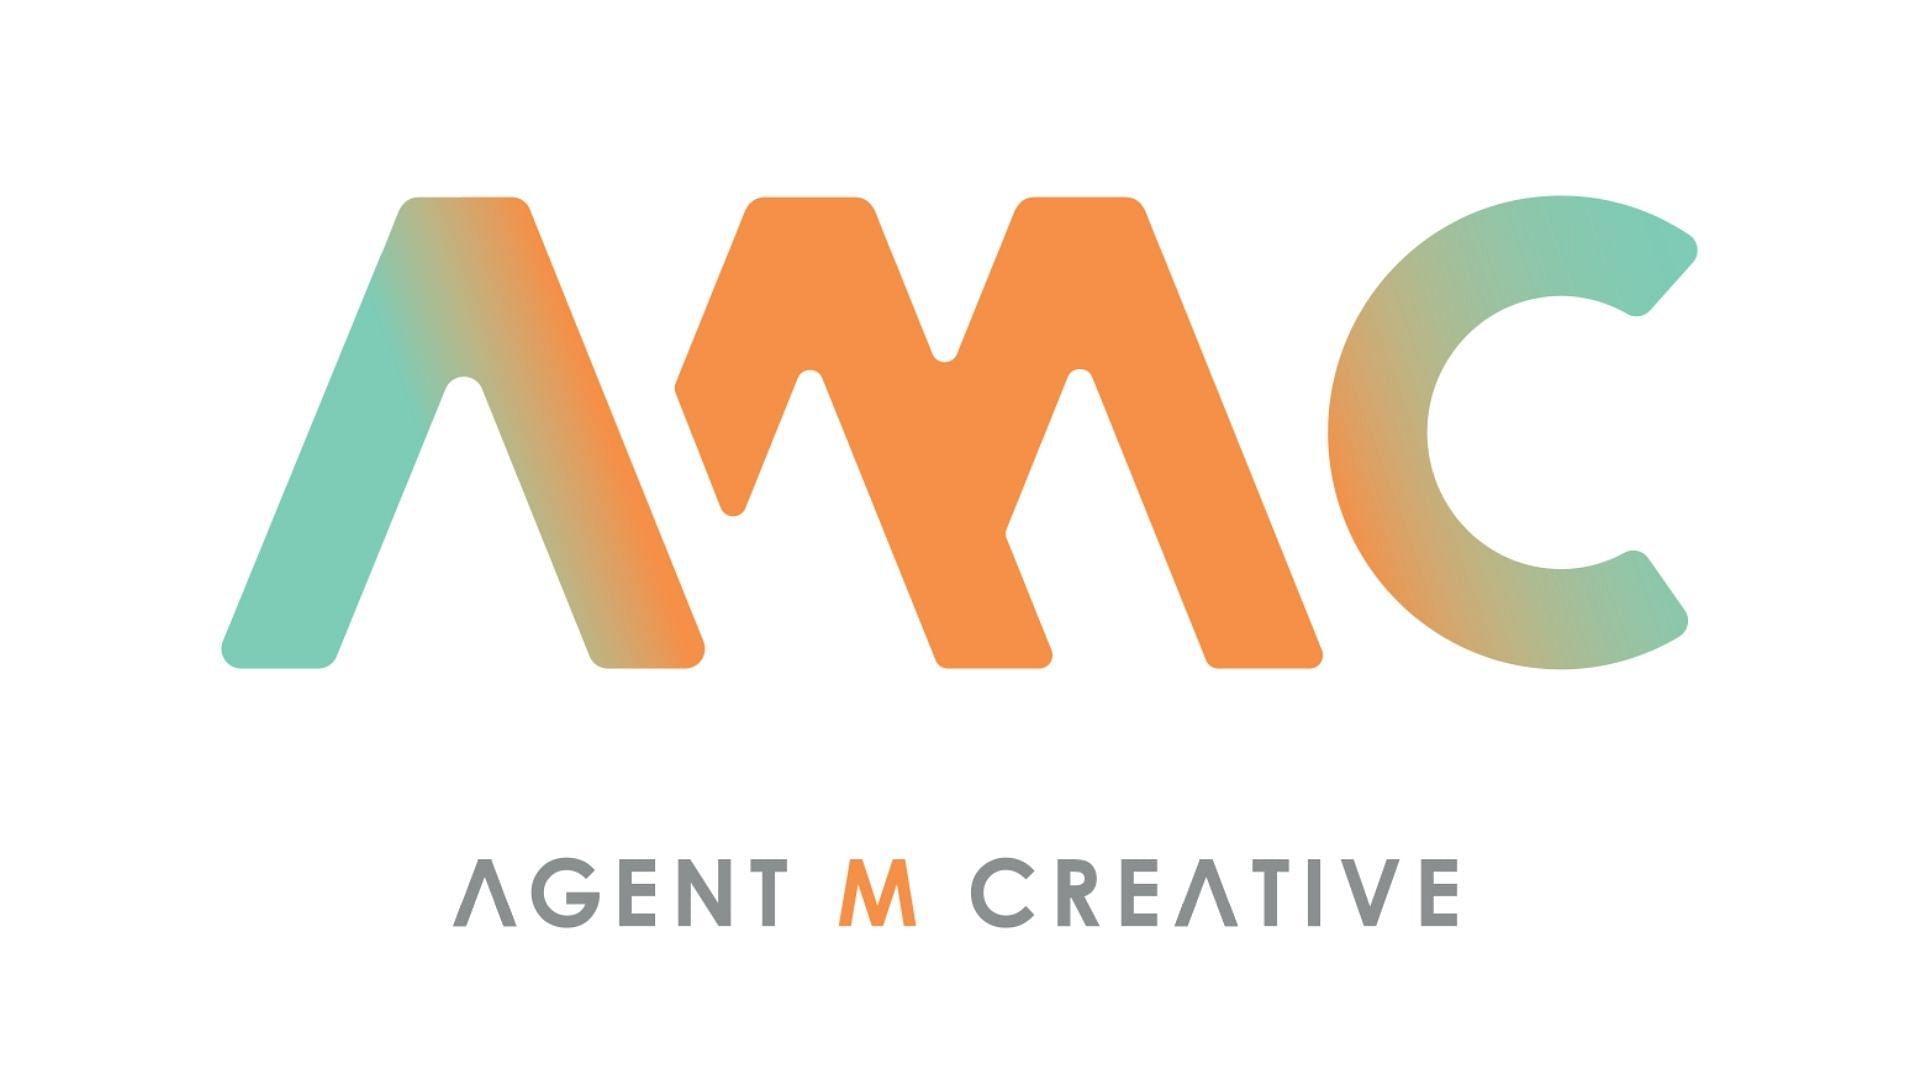 agent m?blur=25